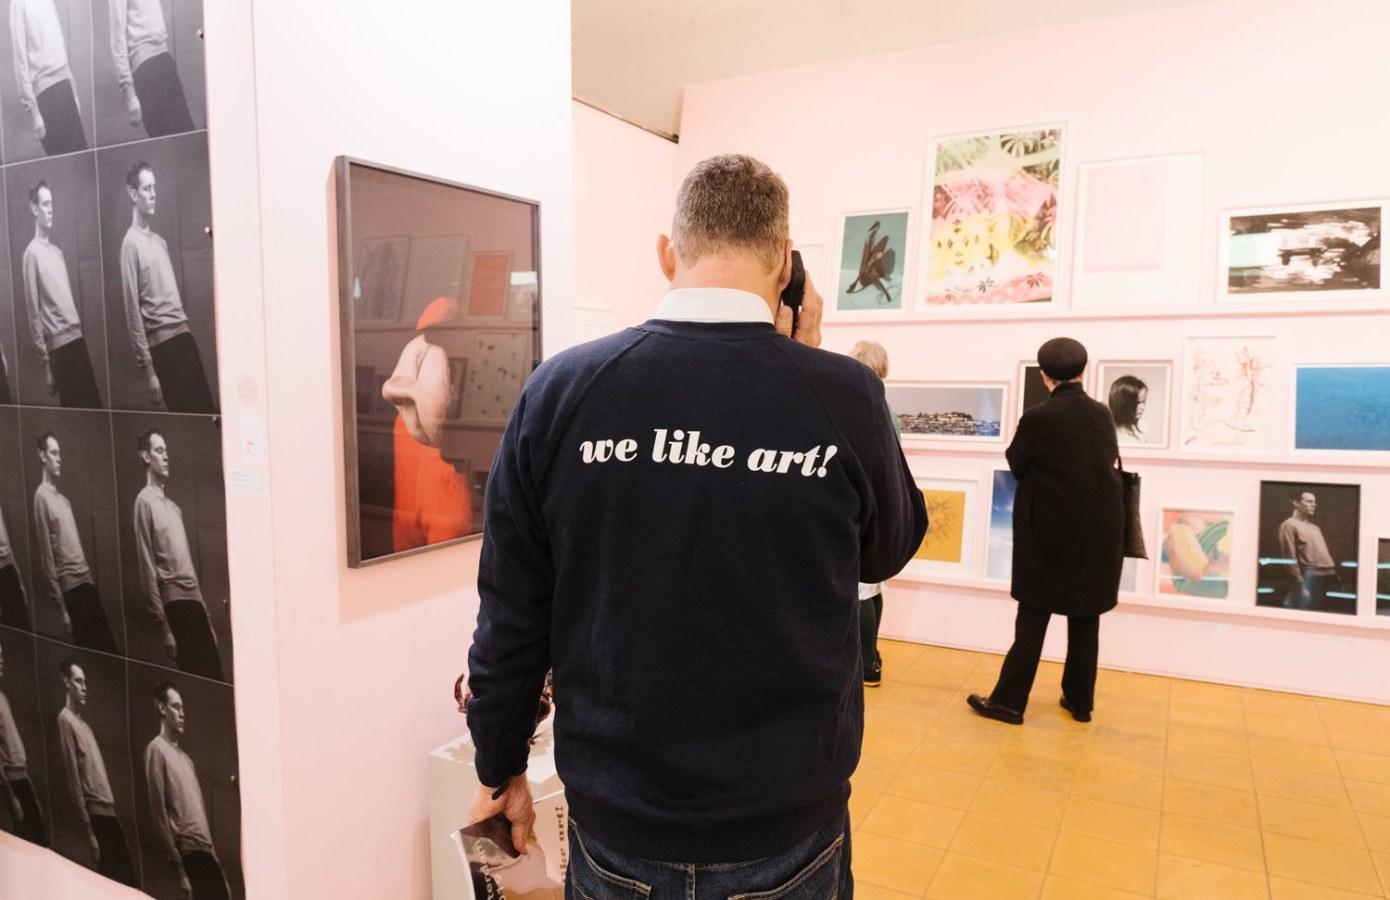 Art Rotterdam 2020, Scarlett Hooft Graafland, Katrin Korfmann, Hellen van Meene, Koen Vermeule,